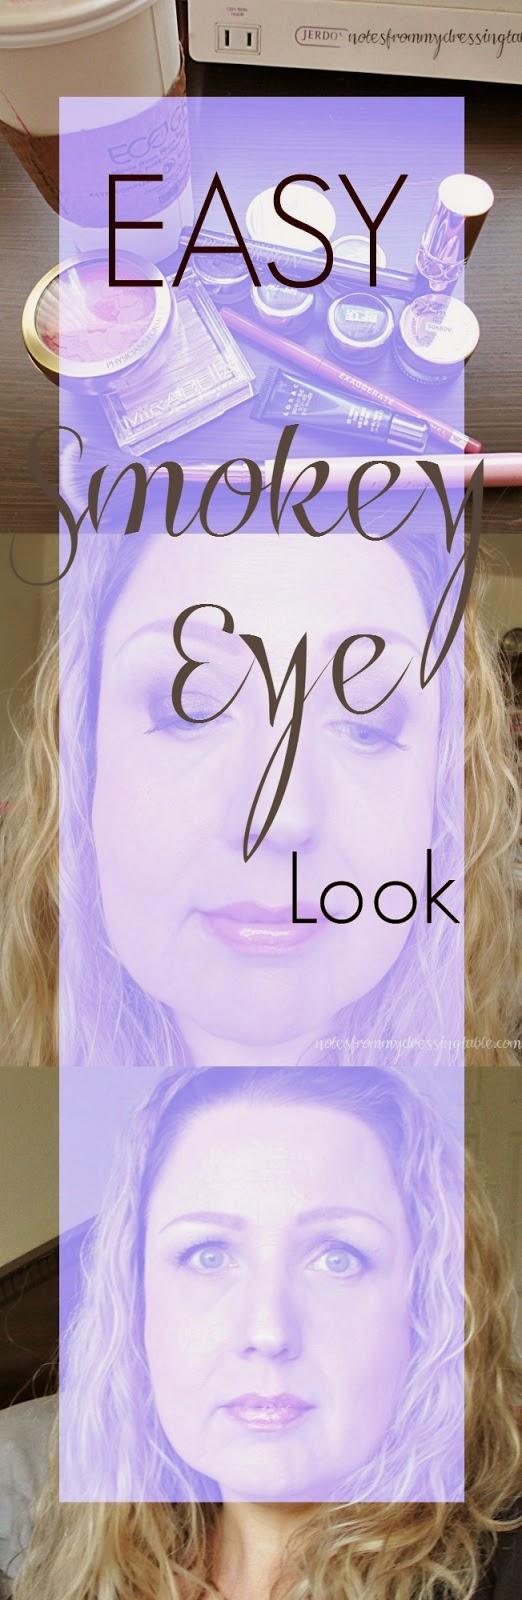 An Easy Smokey Eye Look notesfrommydressingtable.com